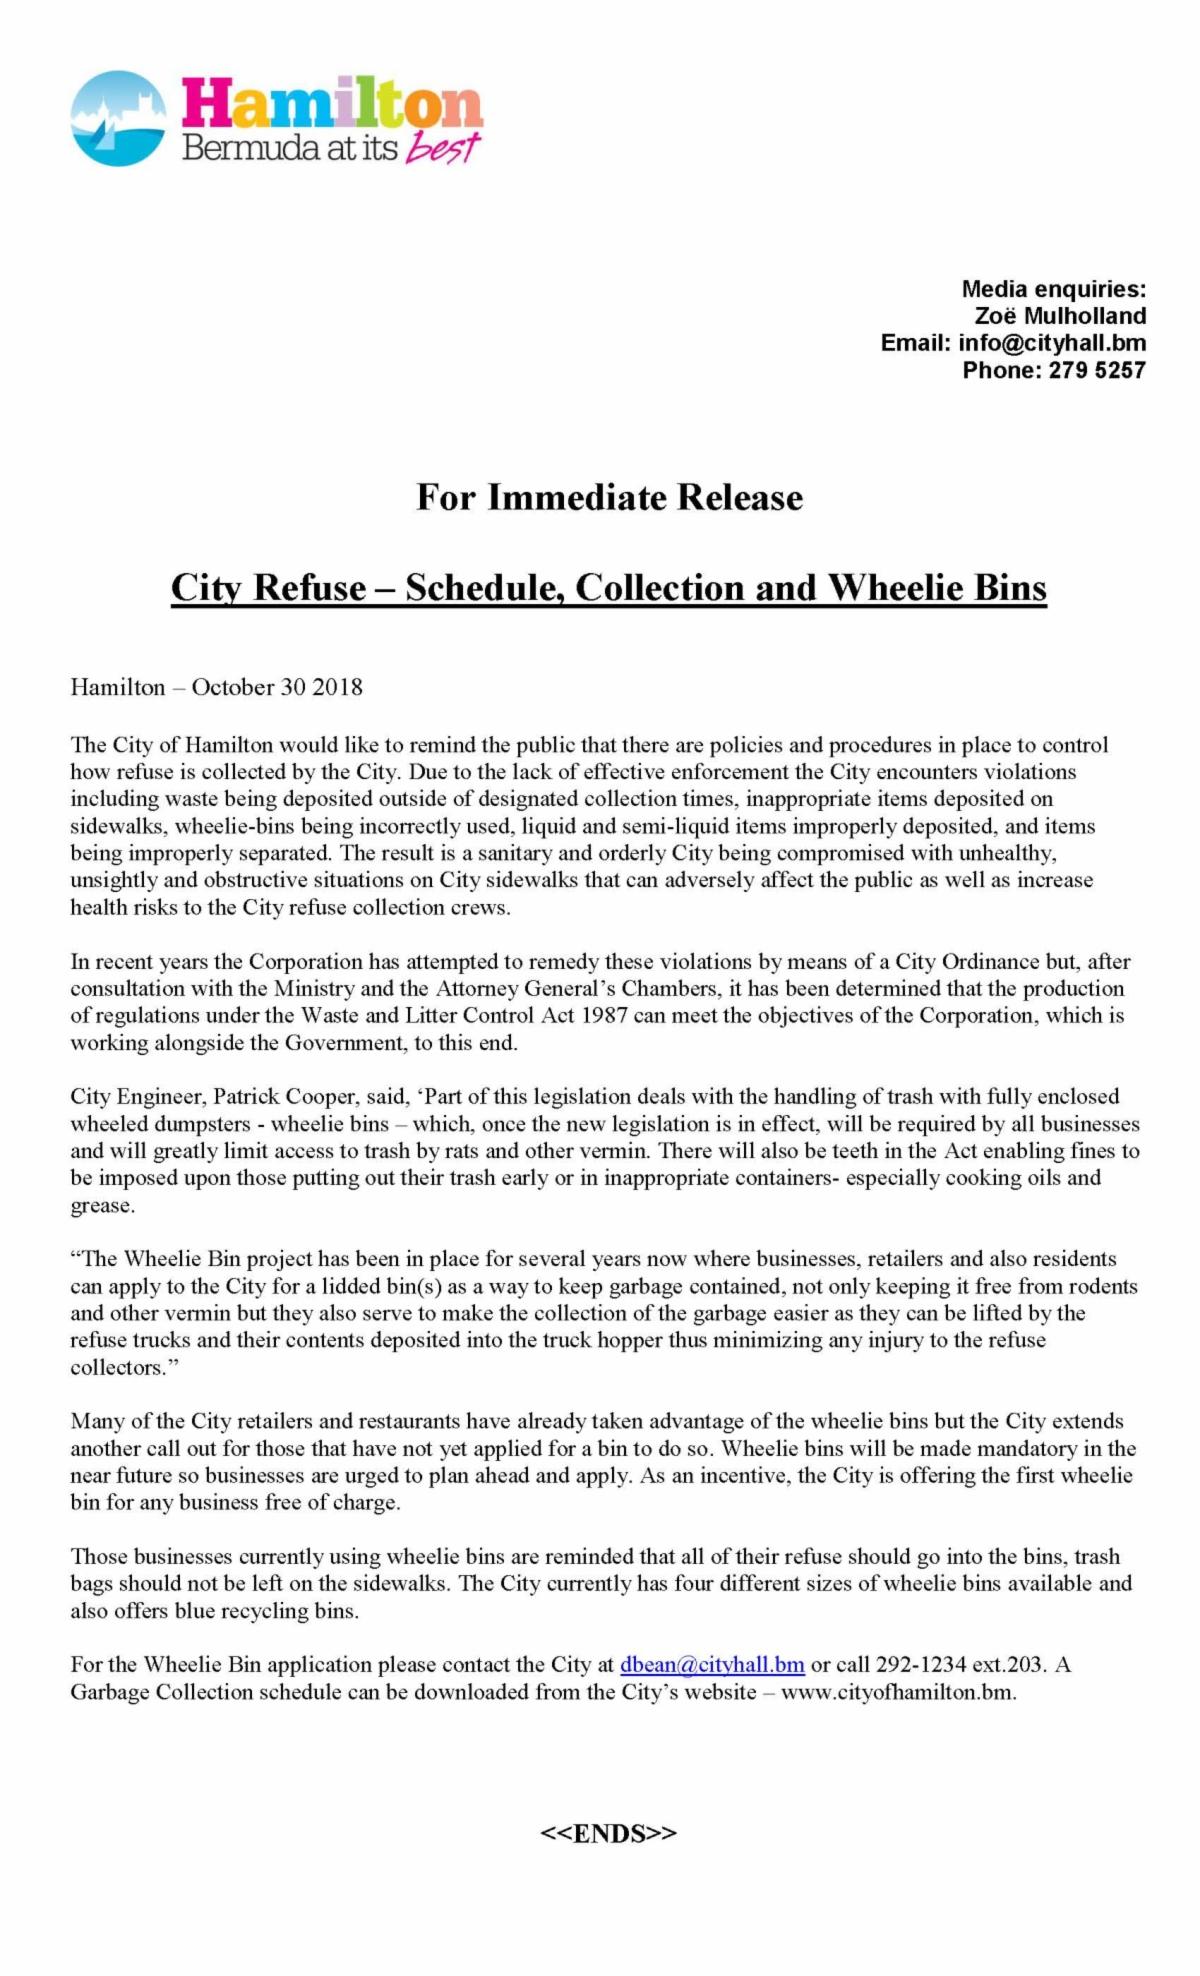 City Of Hamilton Garbage Collection Schedule 2018 Photos